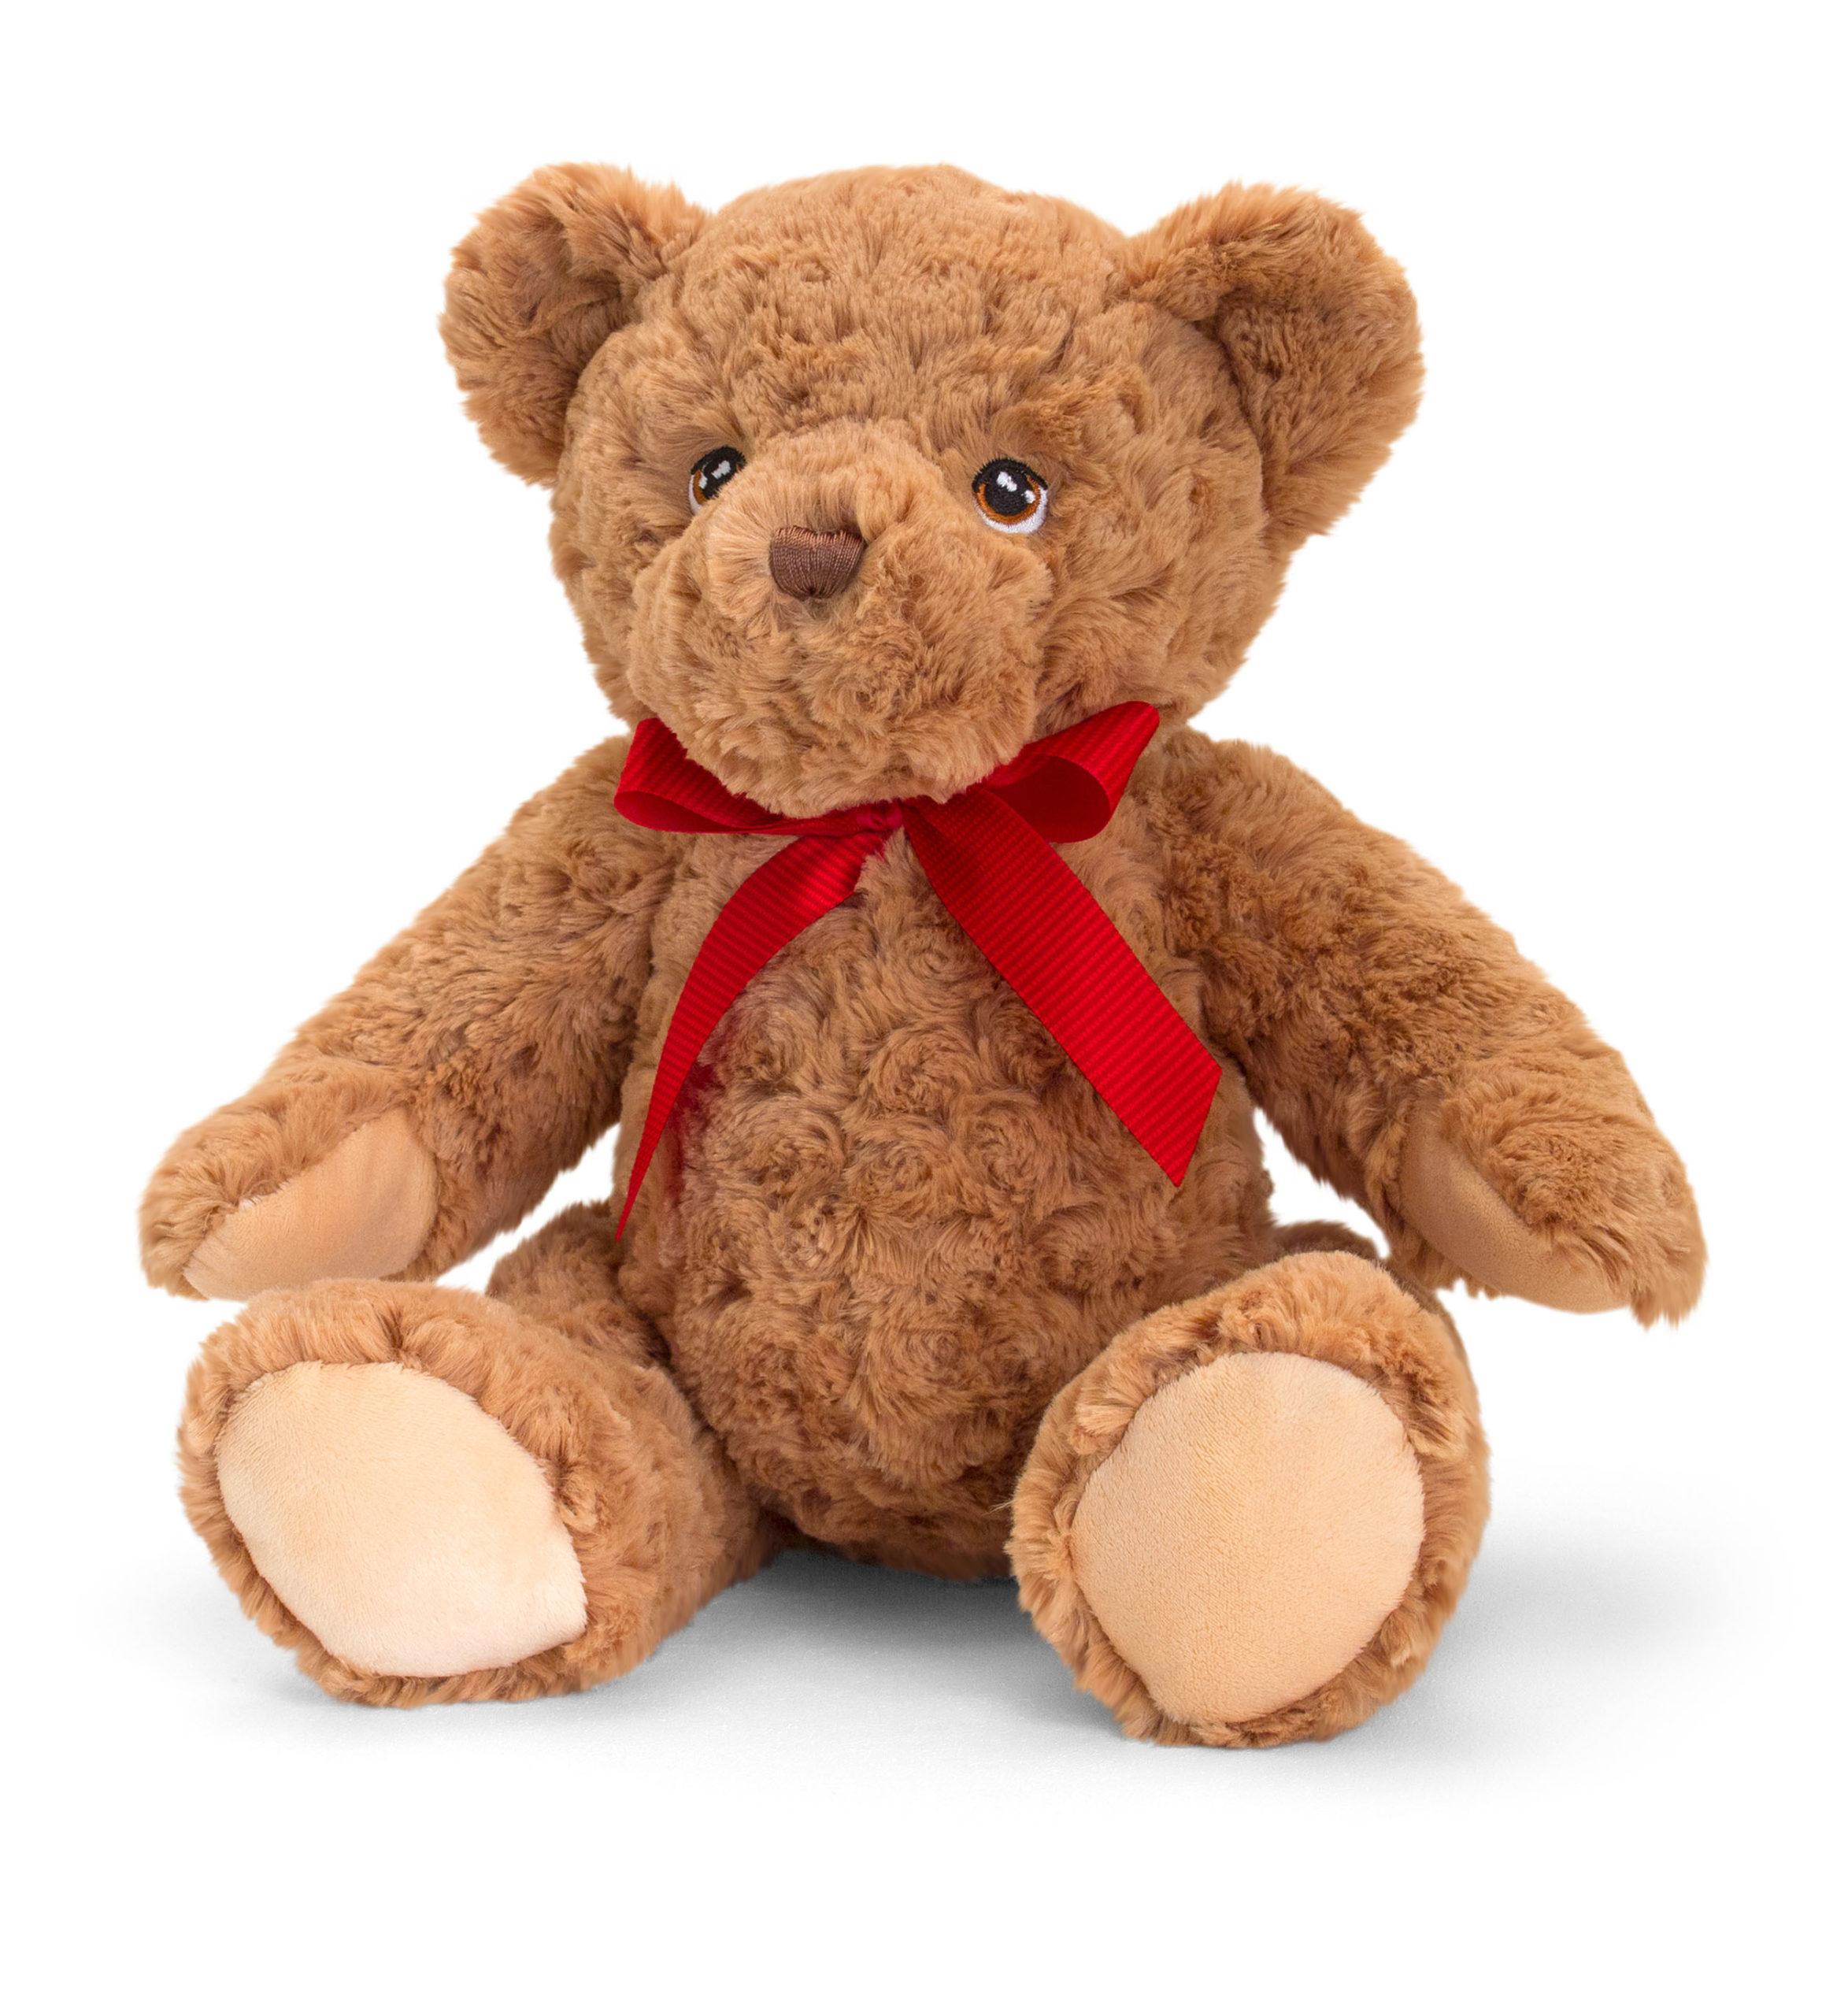 30cm Keeleco Teddy